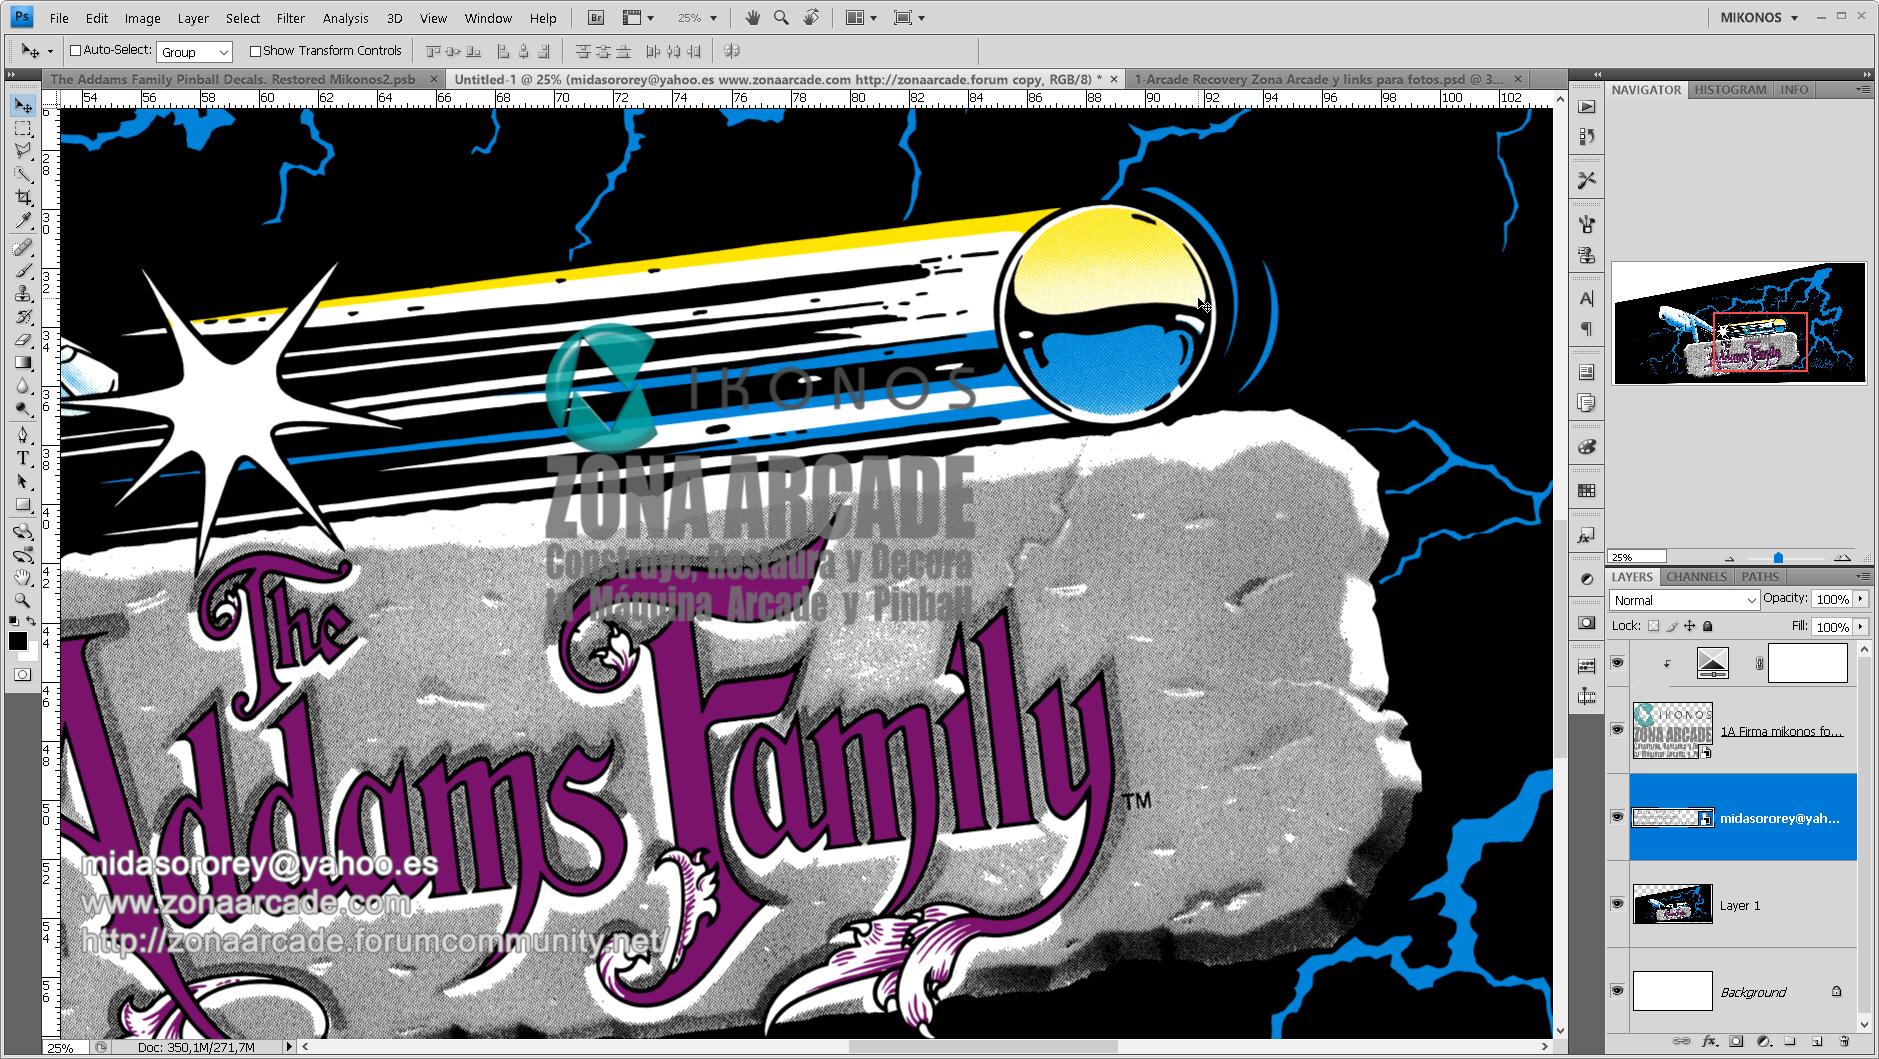 The-Addams-Family-Left-Side-Art-Pinball-Decal.-Restored-Mikonos2.jpg